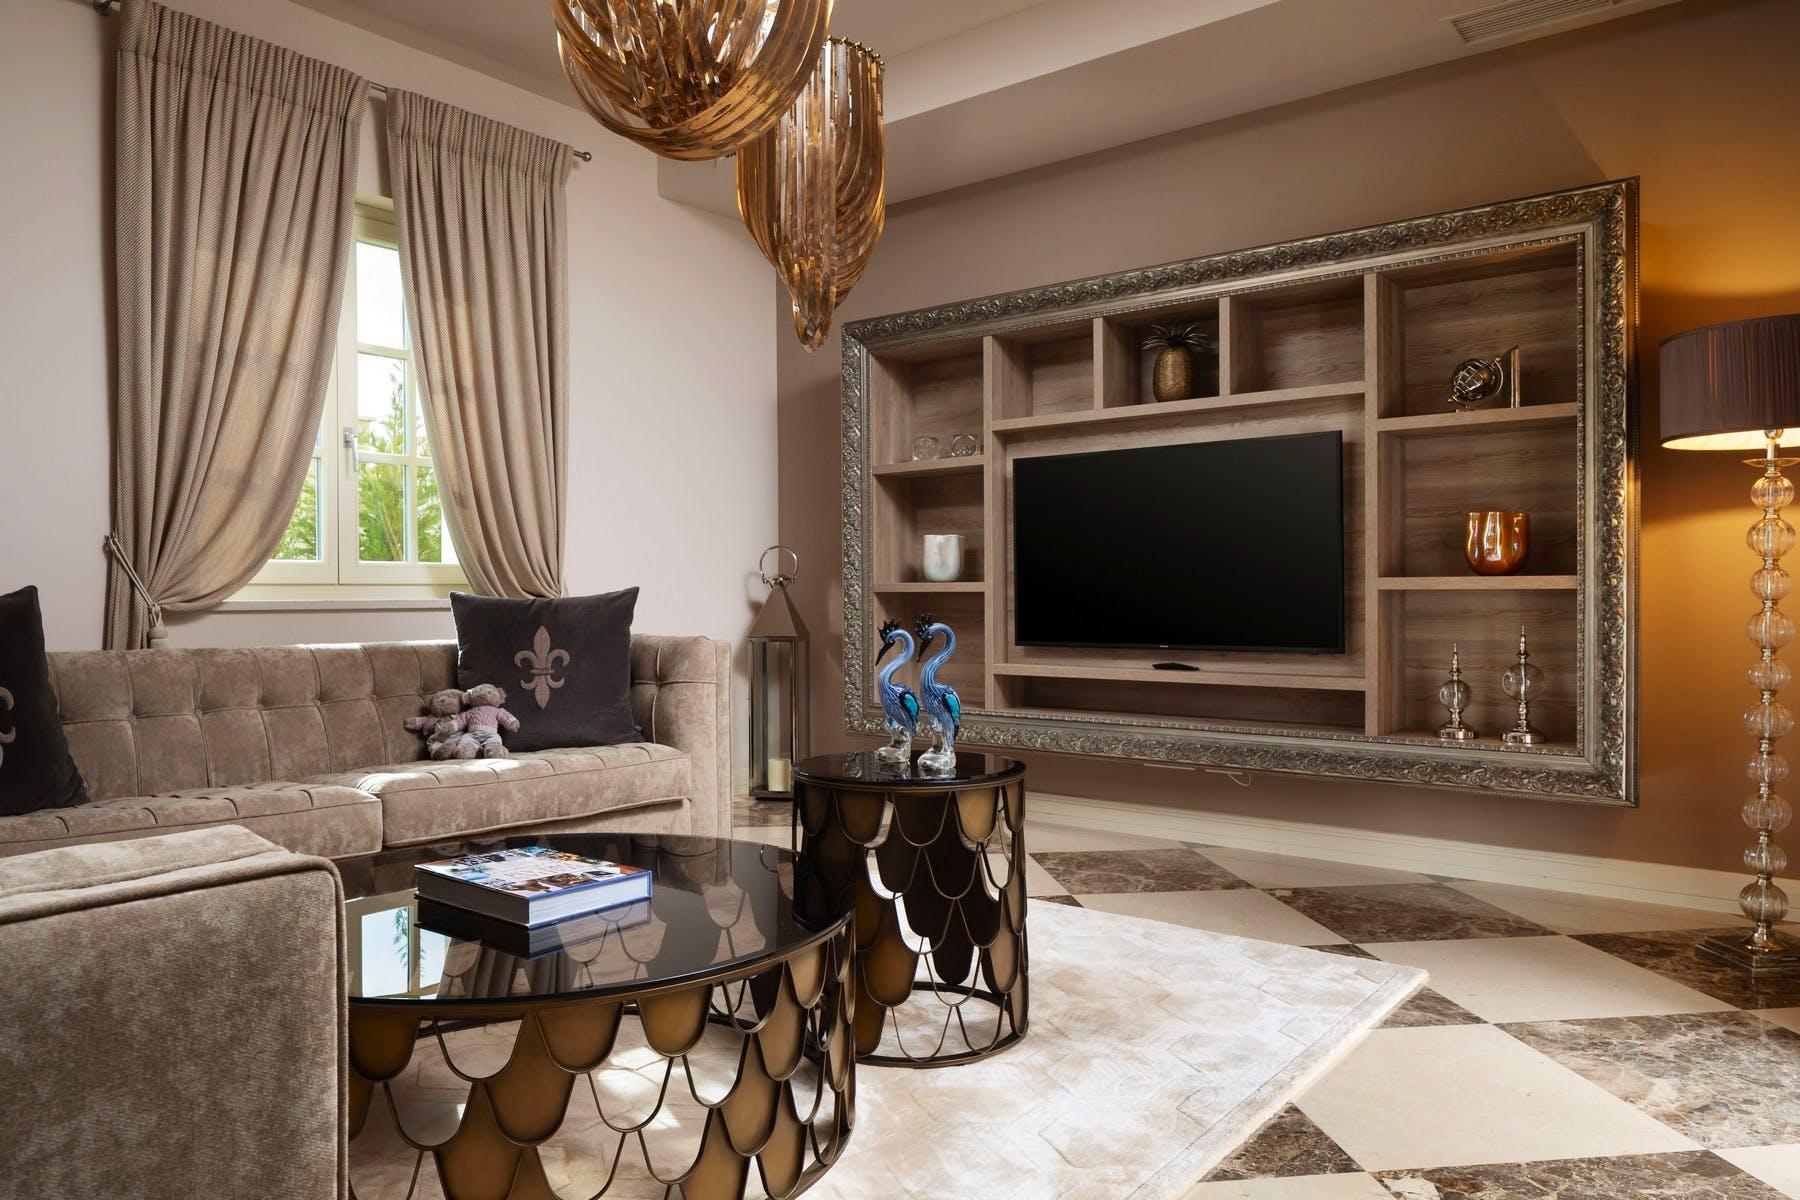 Stylish living room with lavish details